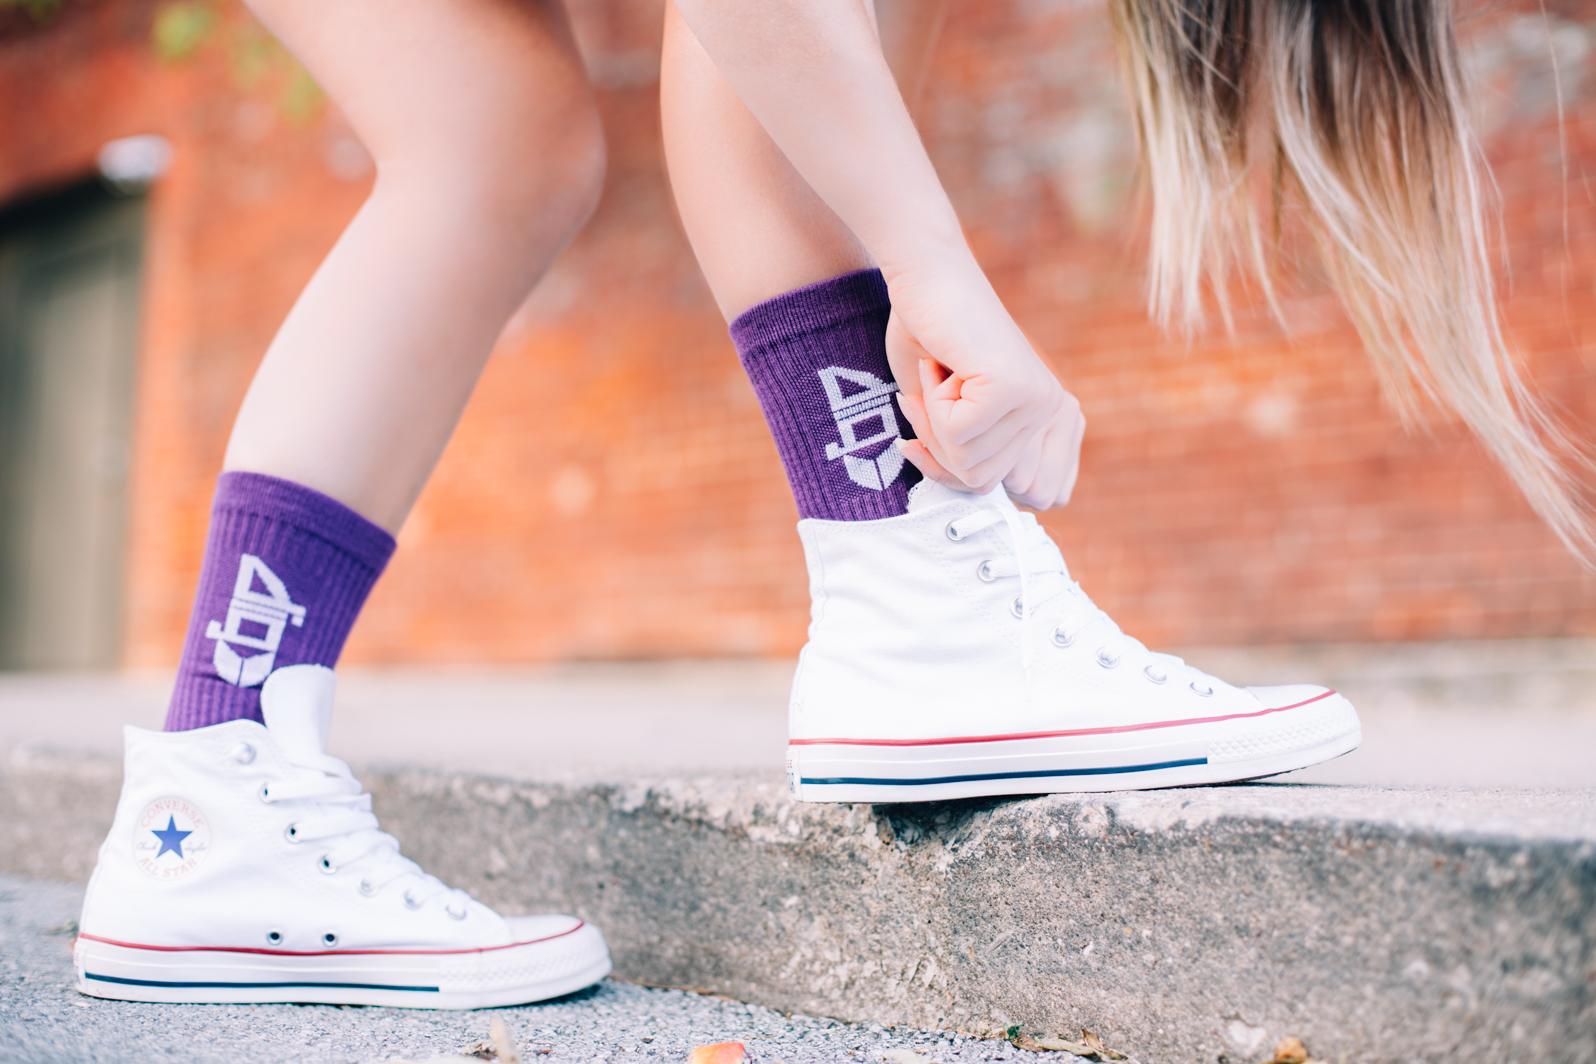 Enjoy style, comfortability, and durability with bamboo socks vs cotton socks.